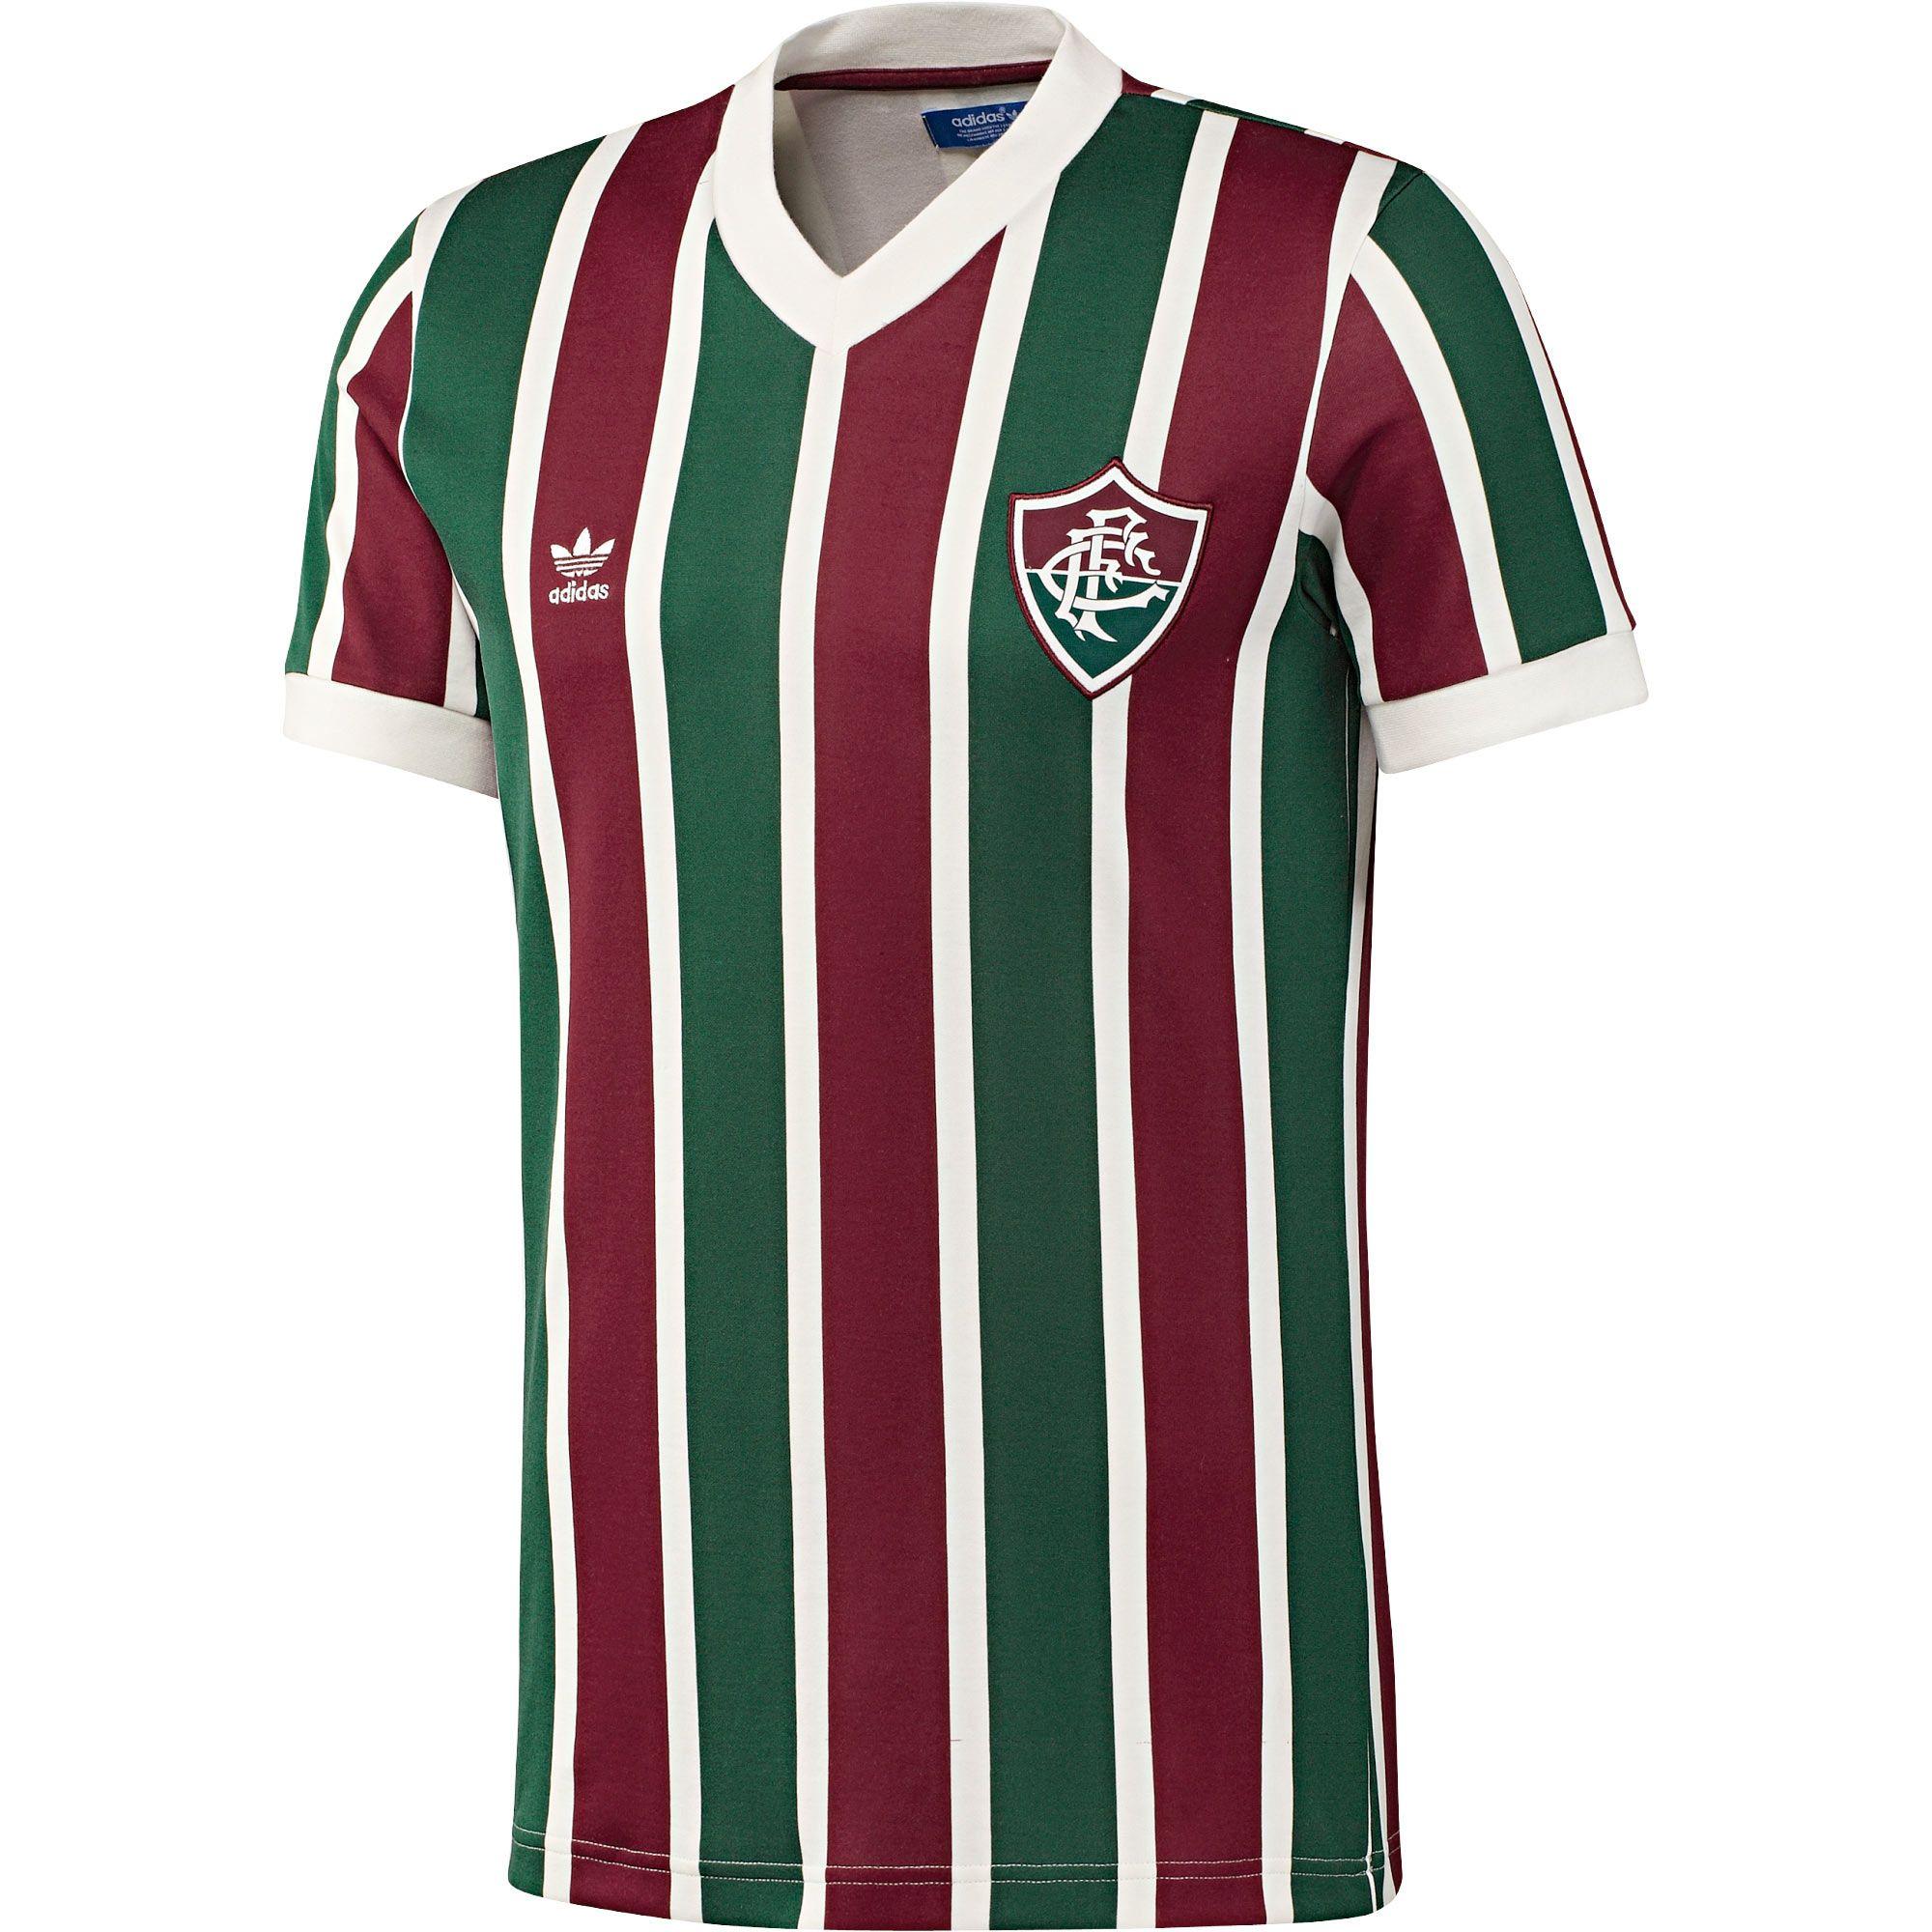 adidas Originals Retro Fluminense FC Football Shirt